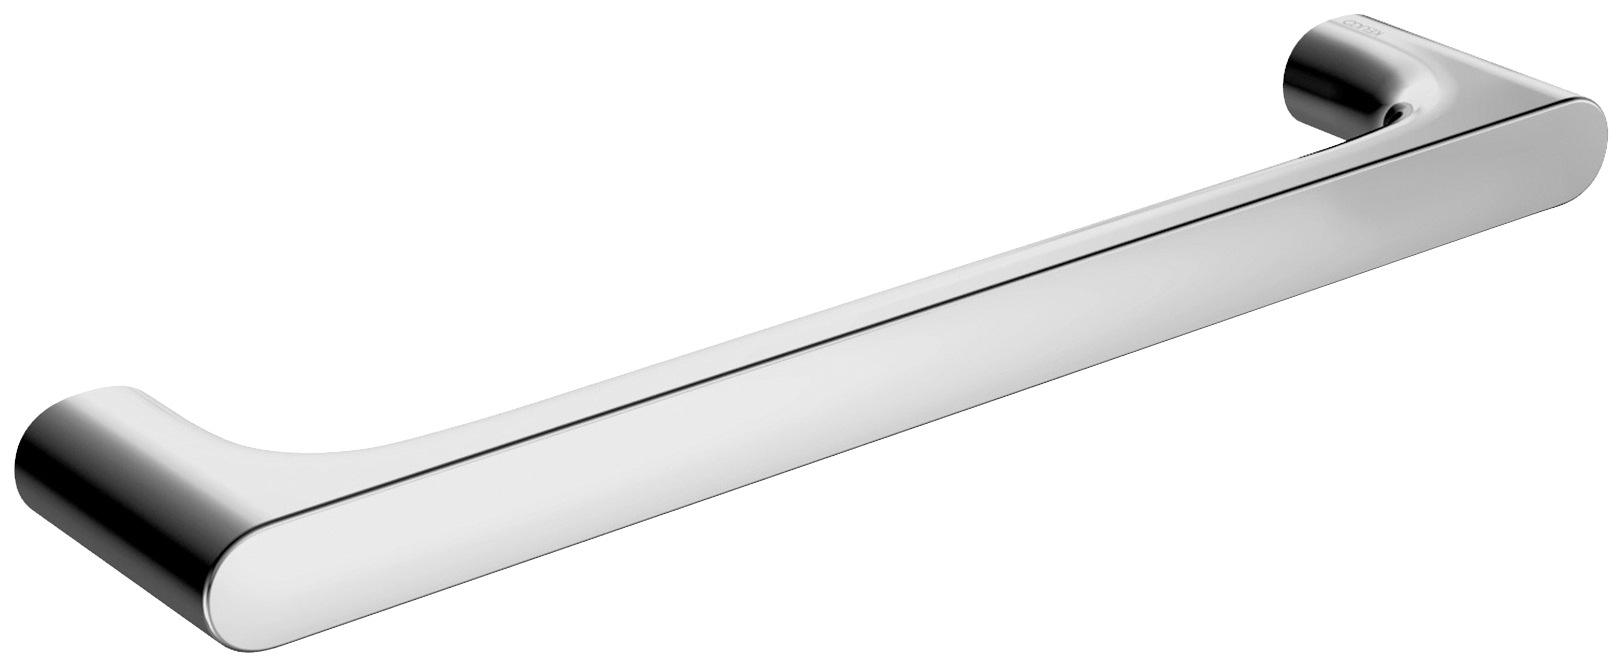 KEUCO Haltegriff »Edition 400«, Breite: 350 mm, verchromt   Bad > Bad-Accessoires > Haltegriffe   KEUCO